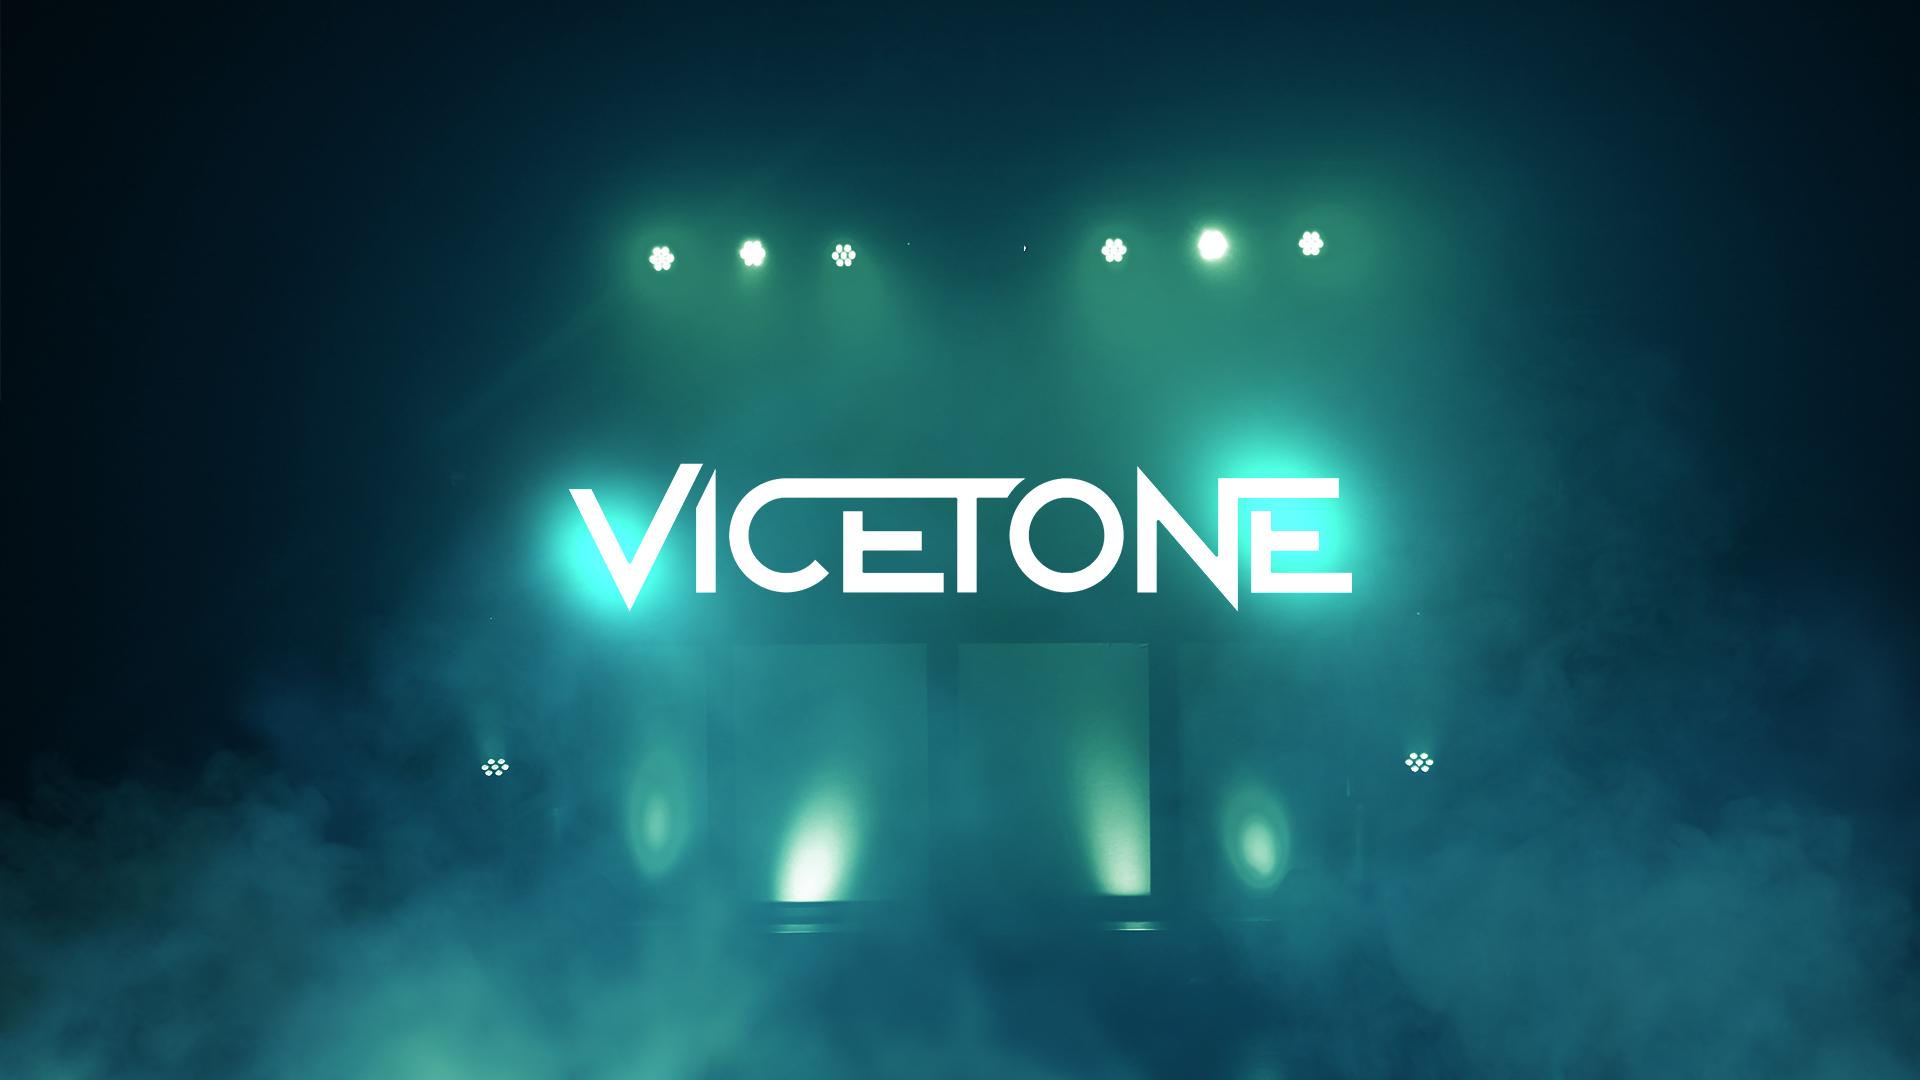 Download Vicetone wallpaper - Free HD Desktop Wallpapers ...